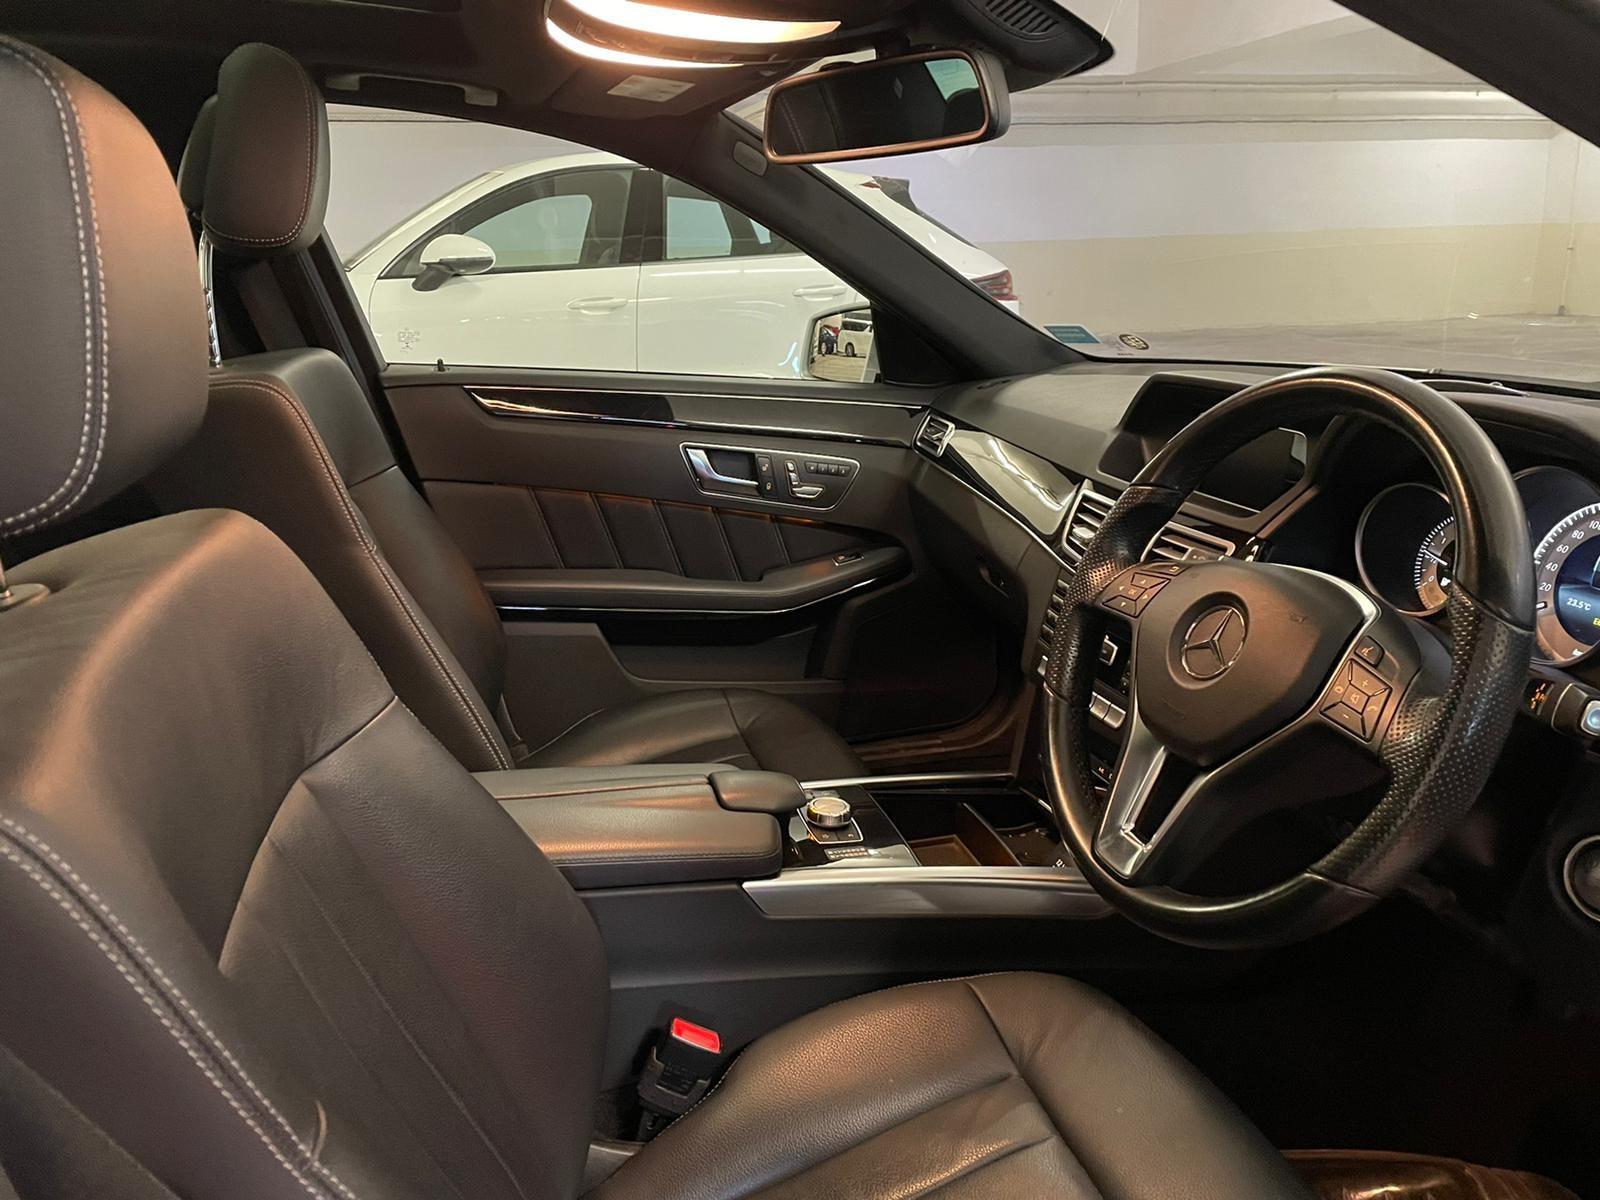 E220 Bluetec Avantgard Facelift (W212) - Image 3